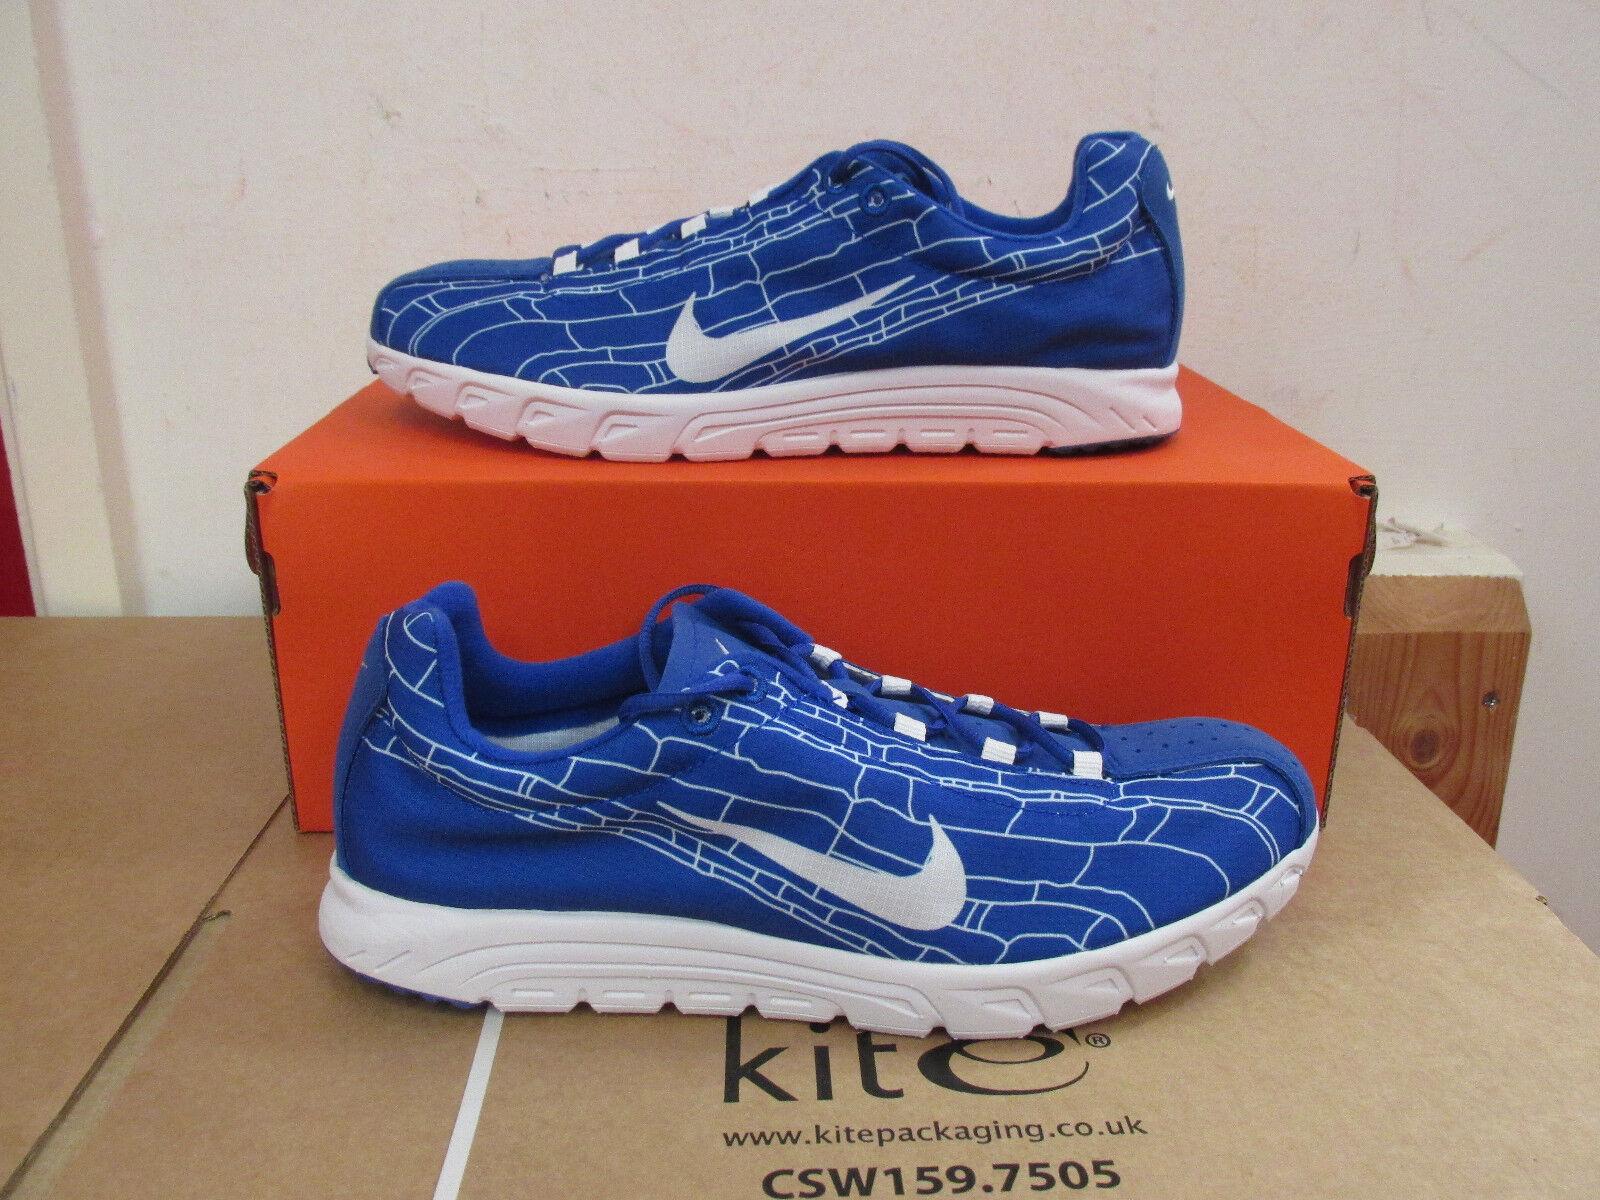 Nike Mayfly Hombre Para Correr Zapatillas 310703 411 Tenis Zapatos aclaramiento